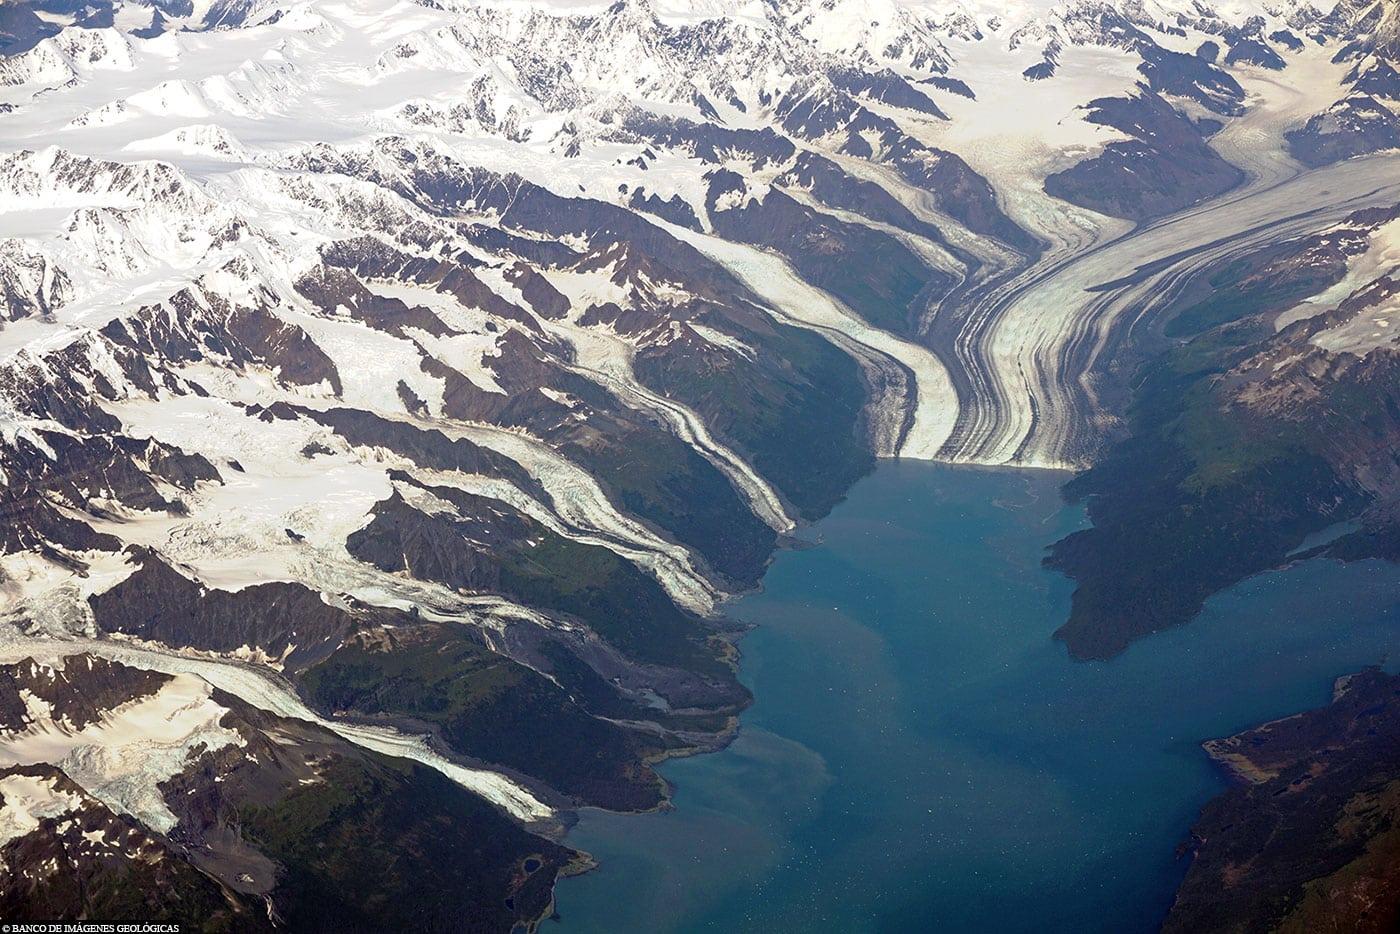 Alaska, College Fjord, Aerial Photo, USA, TravelReport, Princess Cruises, Cruises